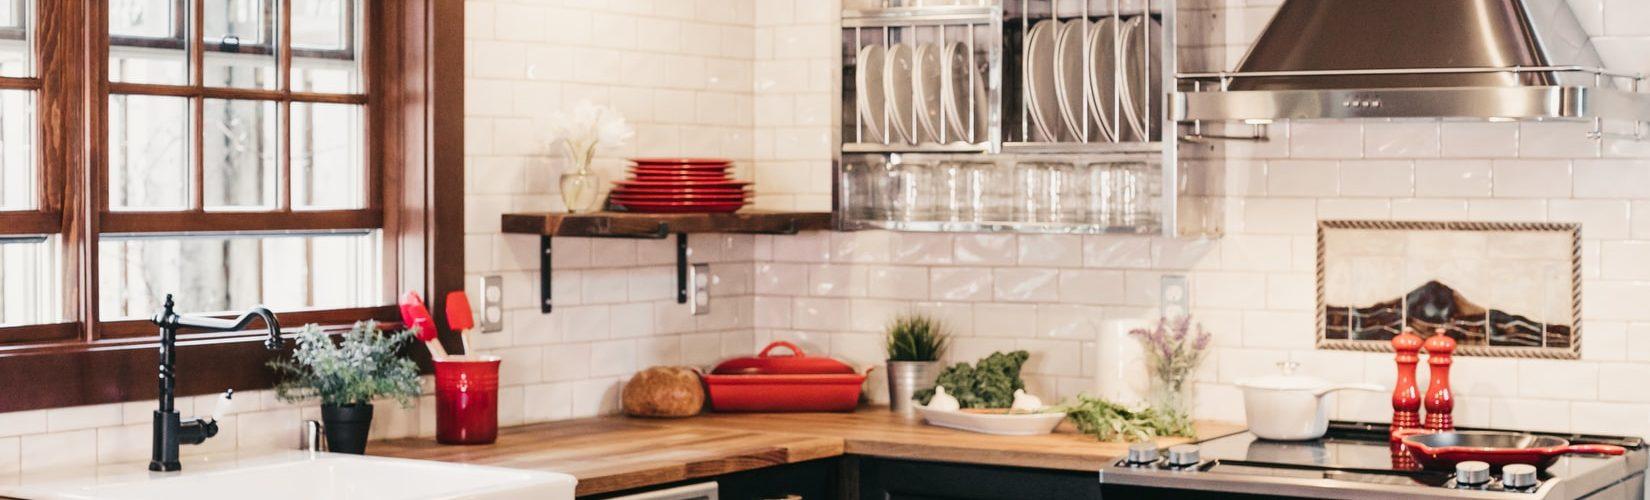 keuken-witte-tegels